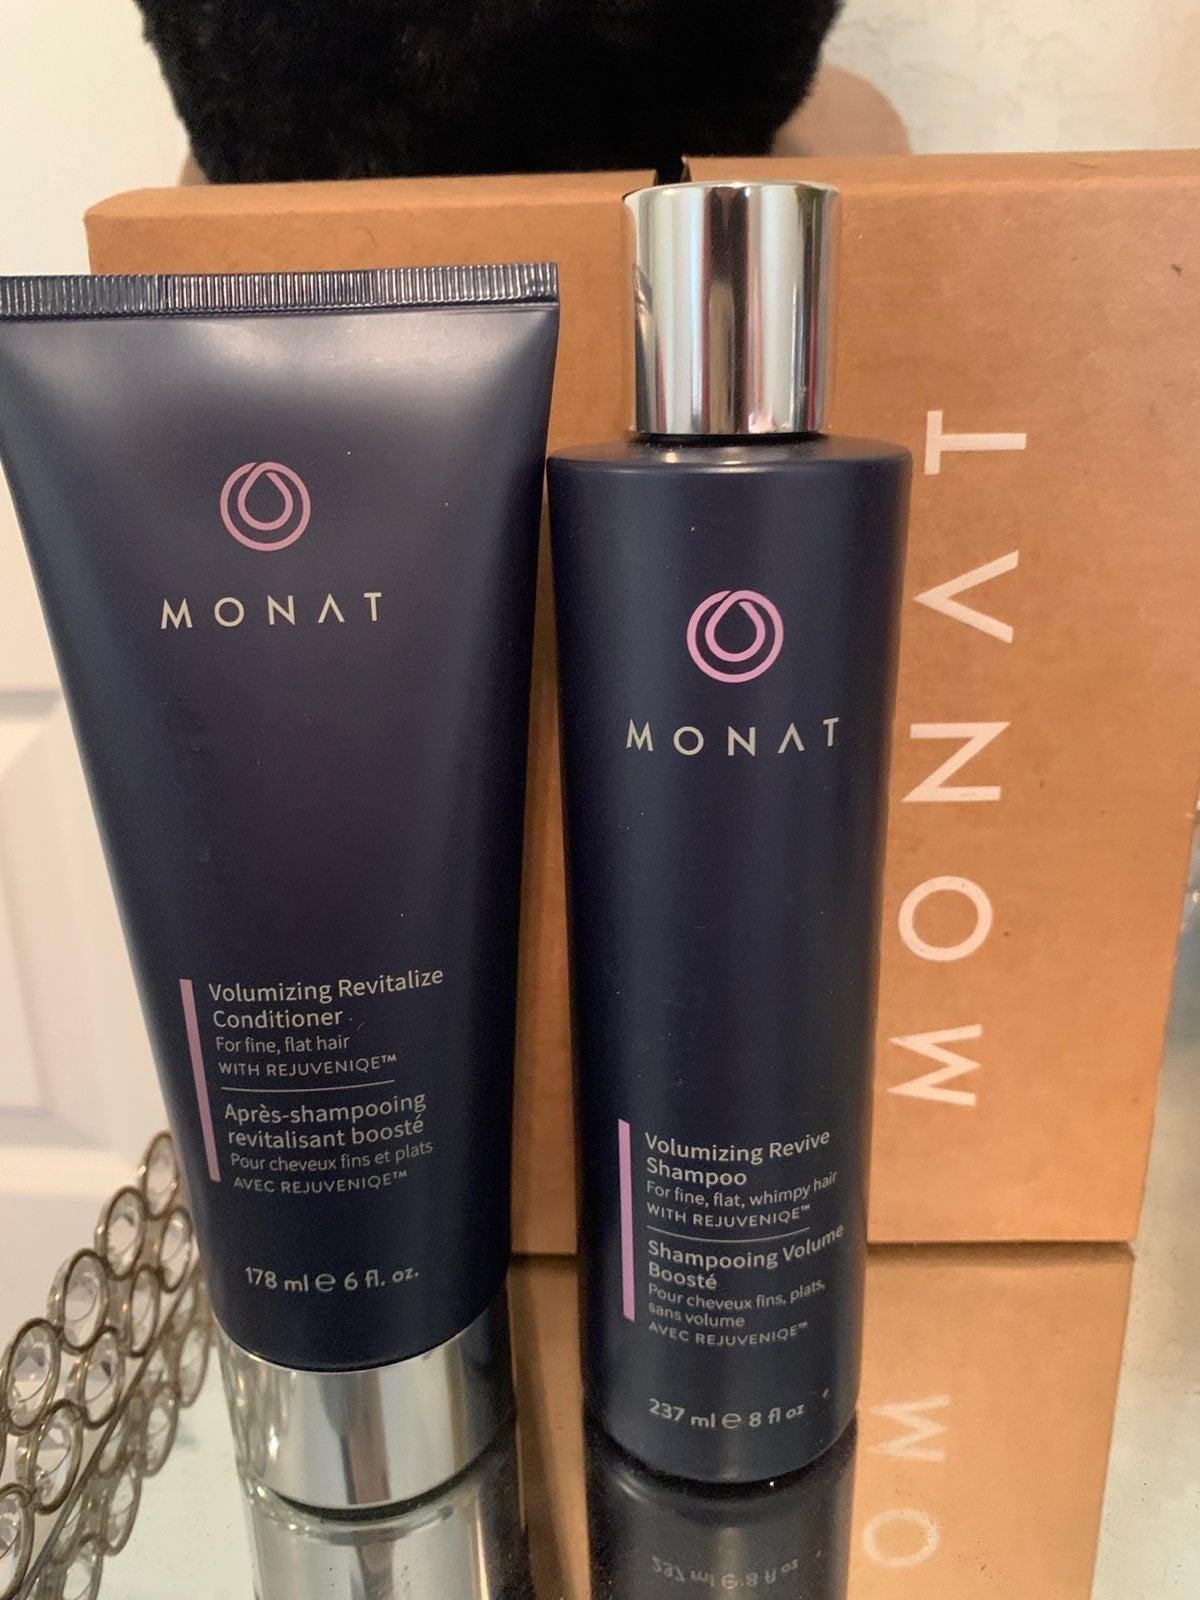 Monat Volumizing Shampoo/Conditioner